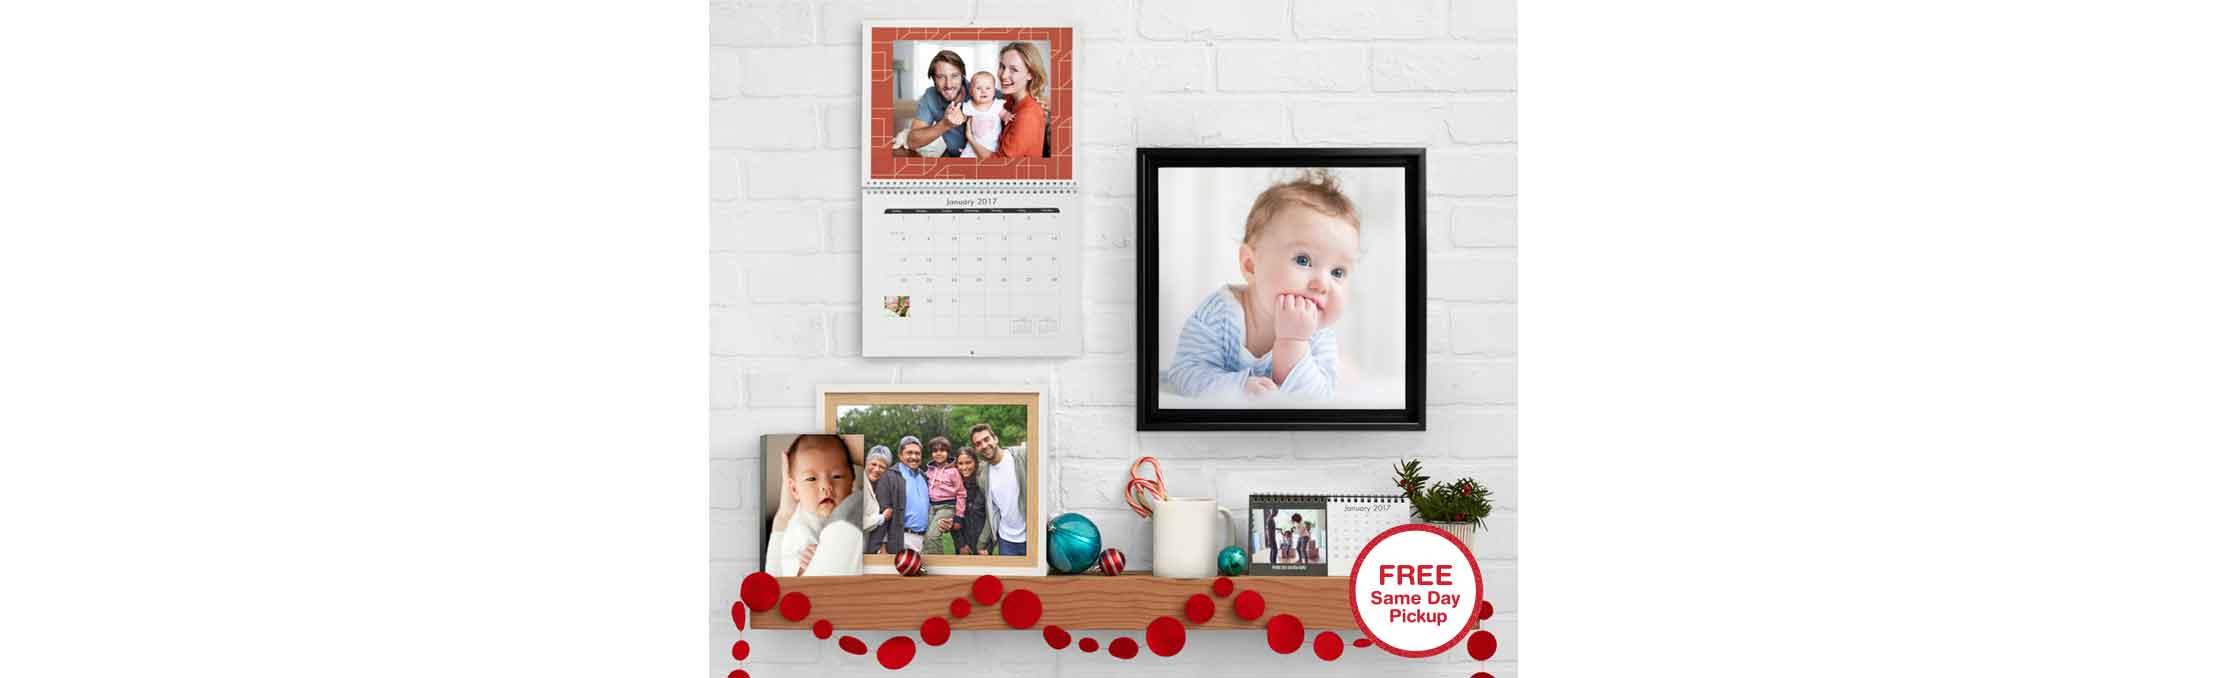 Last Minute Photo Gift Ideas | Walgreens Photo Blog - Walgreens Photo